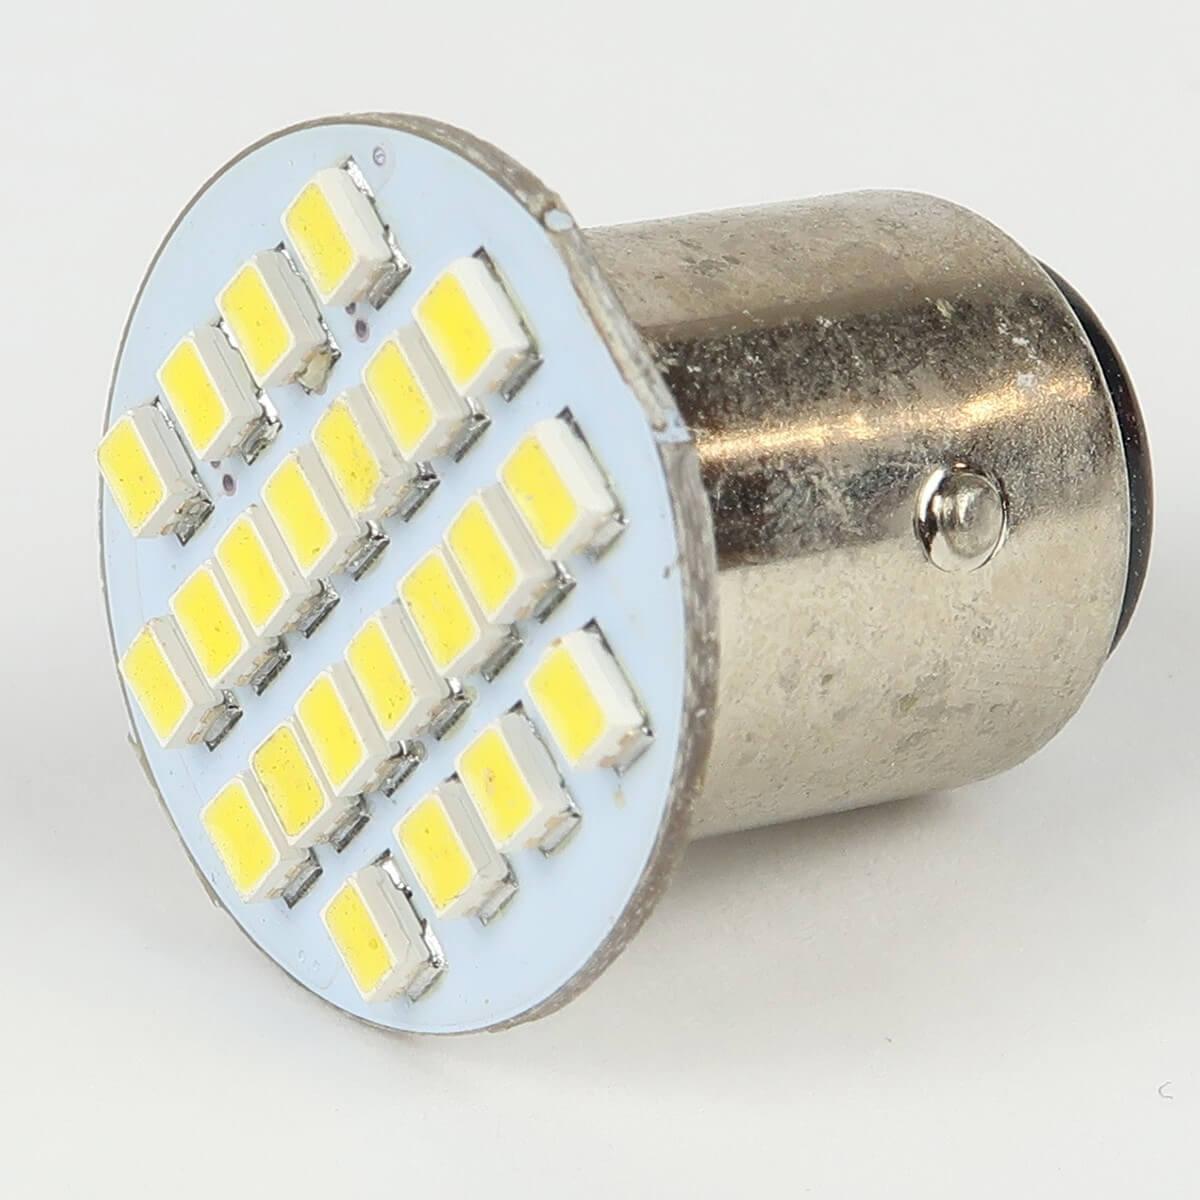 amazon dc dp exit lights wedge emergency bulb base warm led com white miniature replaces light